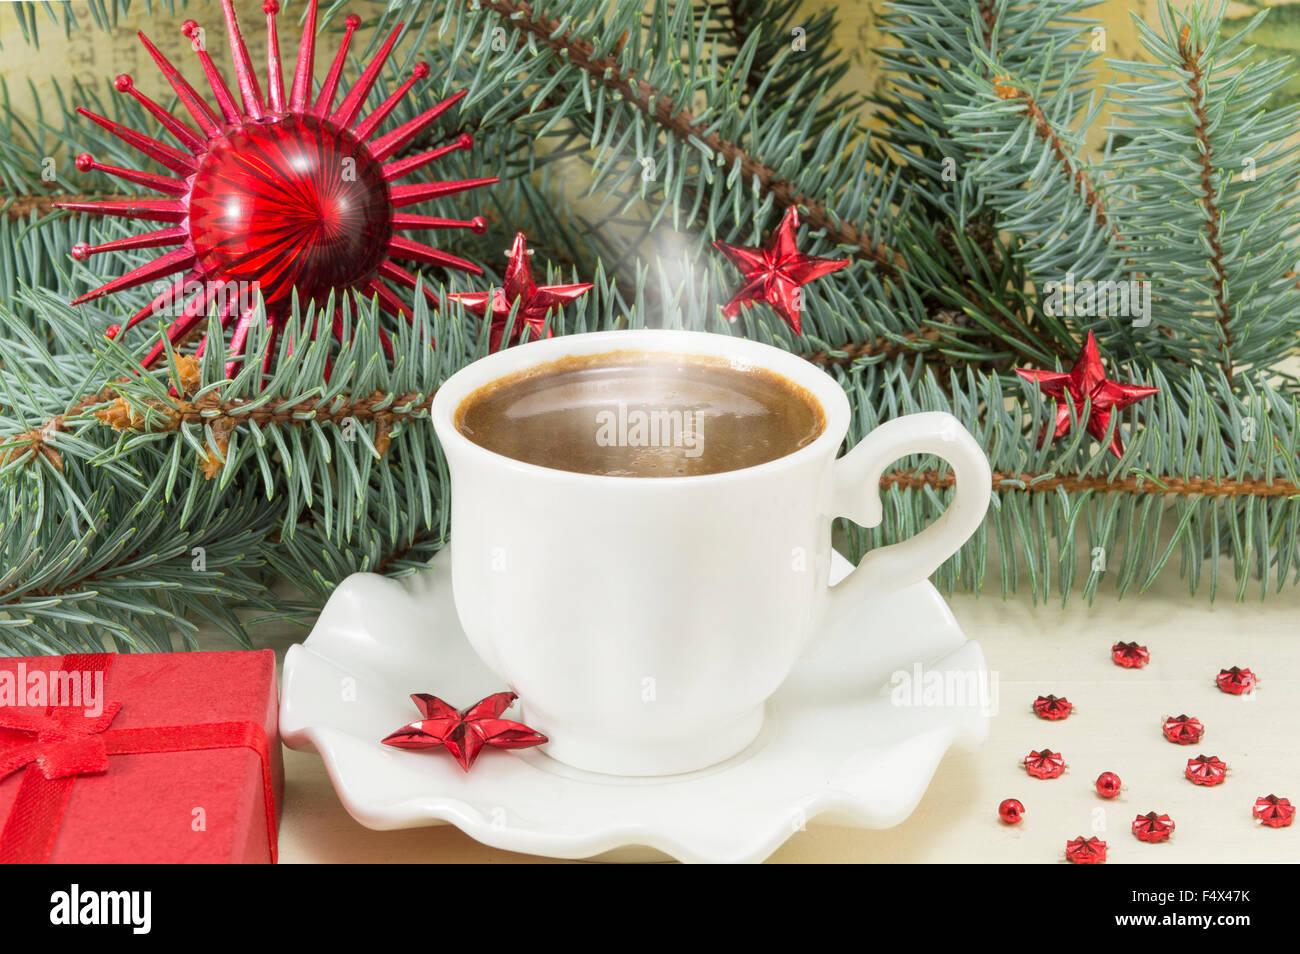 Coffee Christmas Ornaments.Winter Hot Coffee Time Hot Coffee And Christmas Ornaments